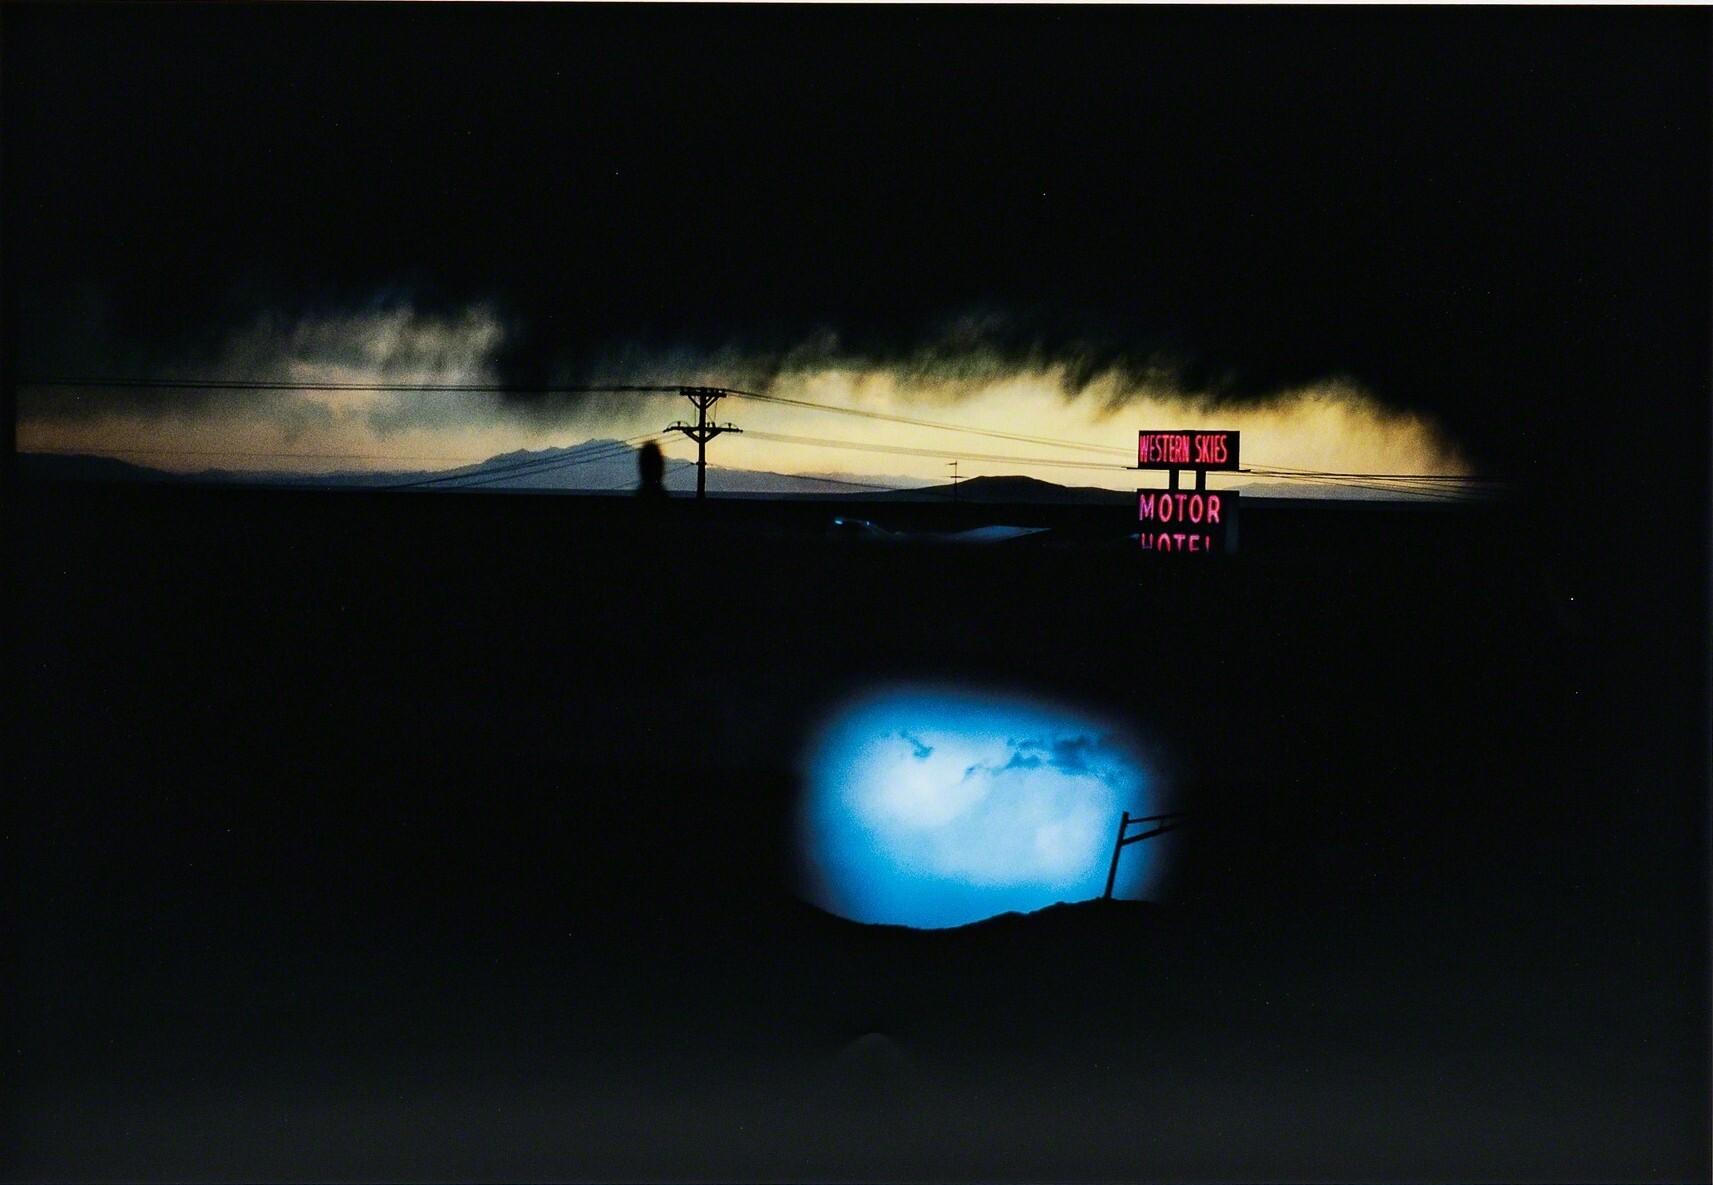 Western Skies Motel, Нью-Мексико, 1978. Фотограф Эрнст Хаас